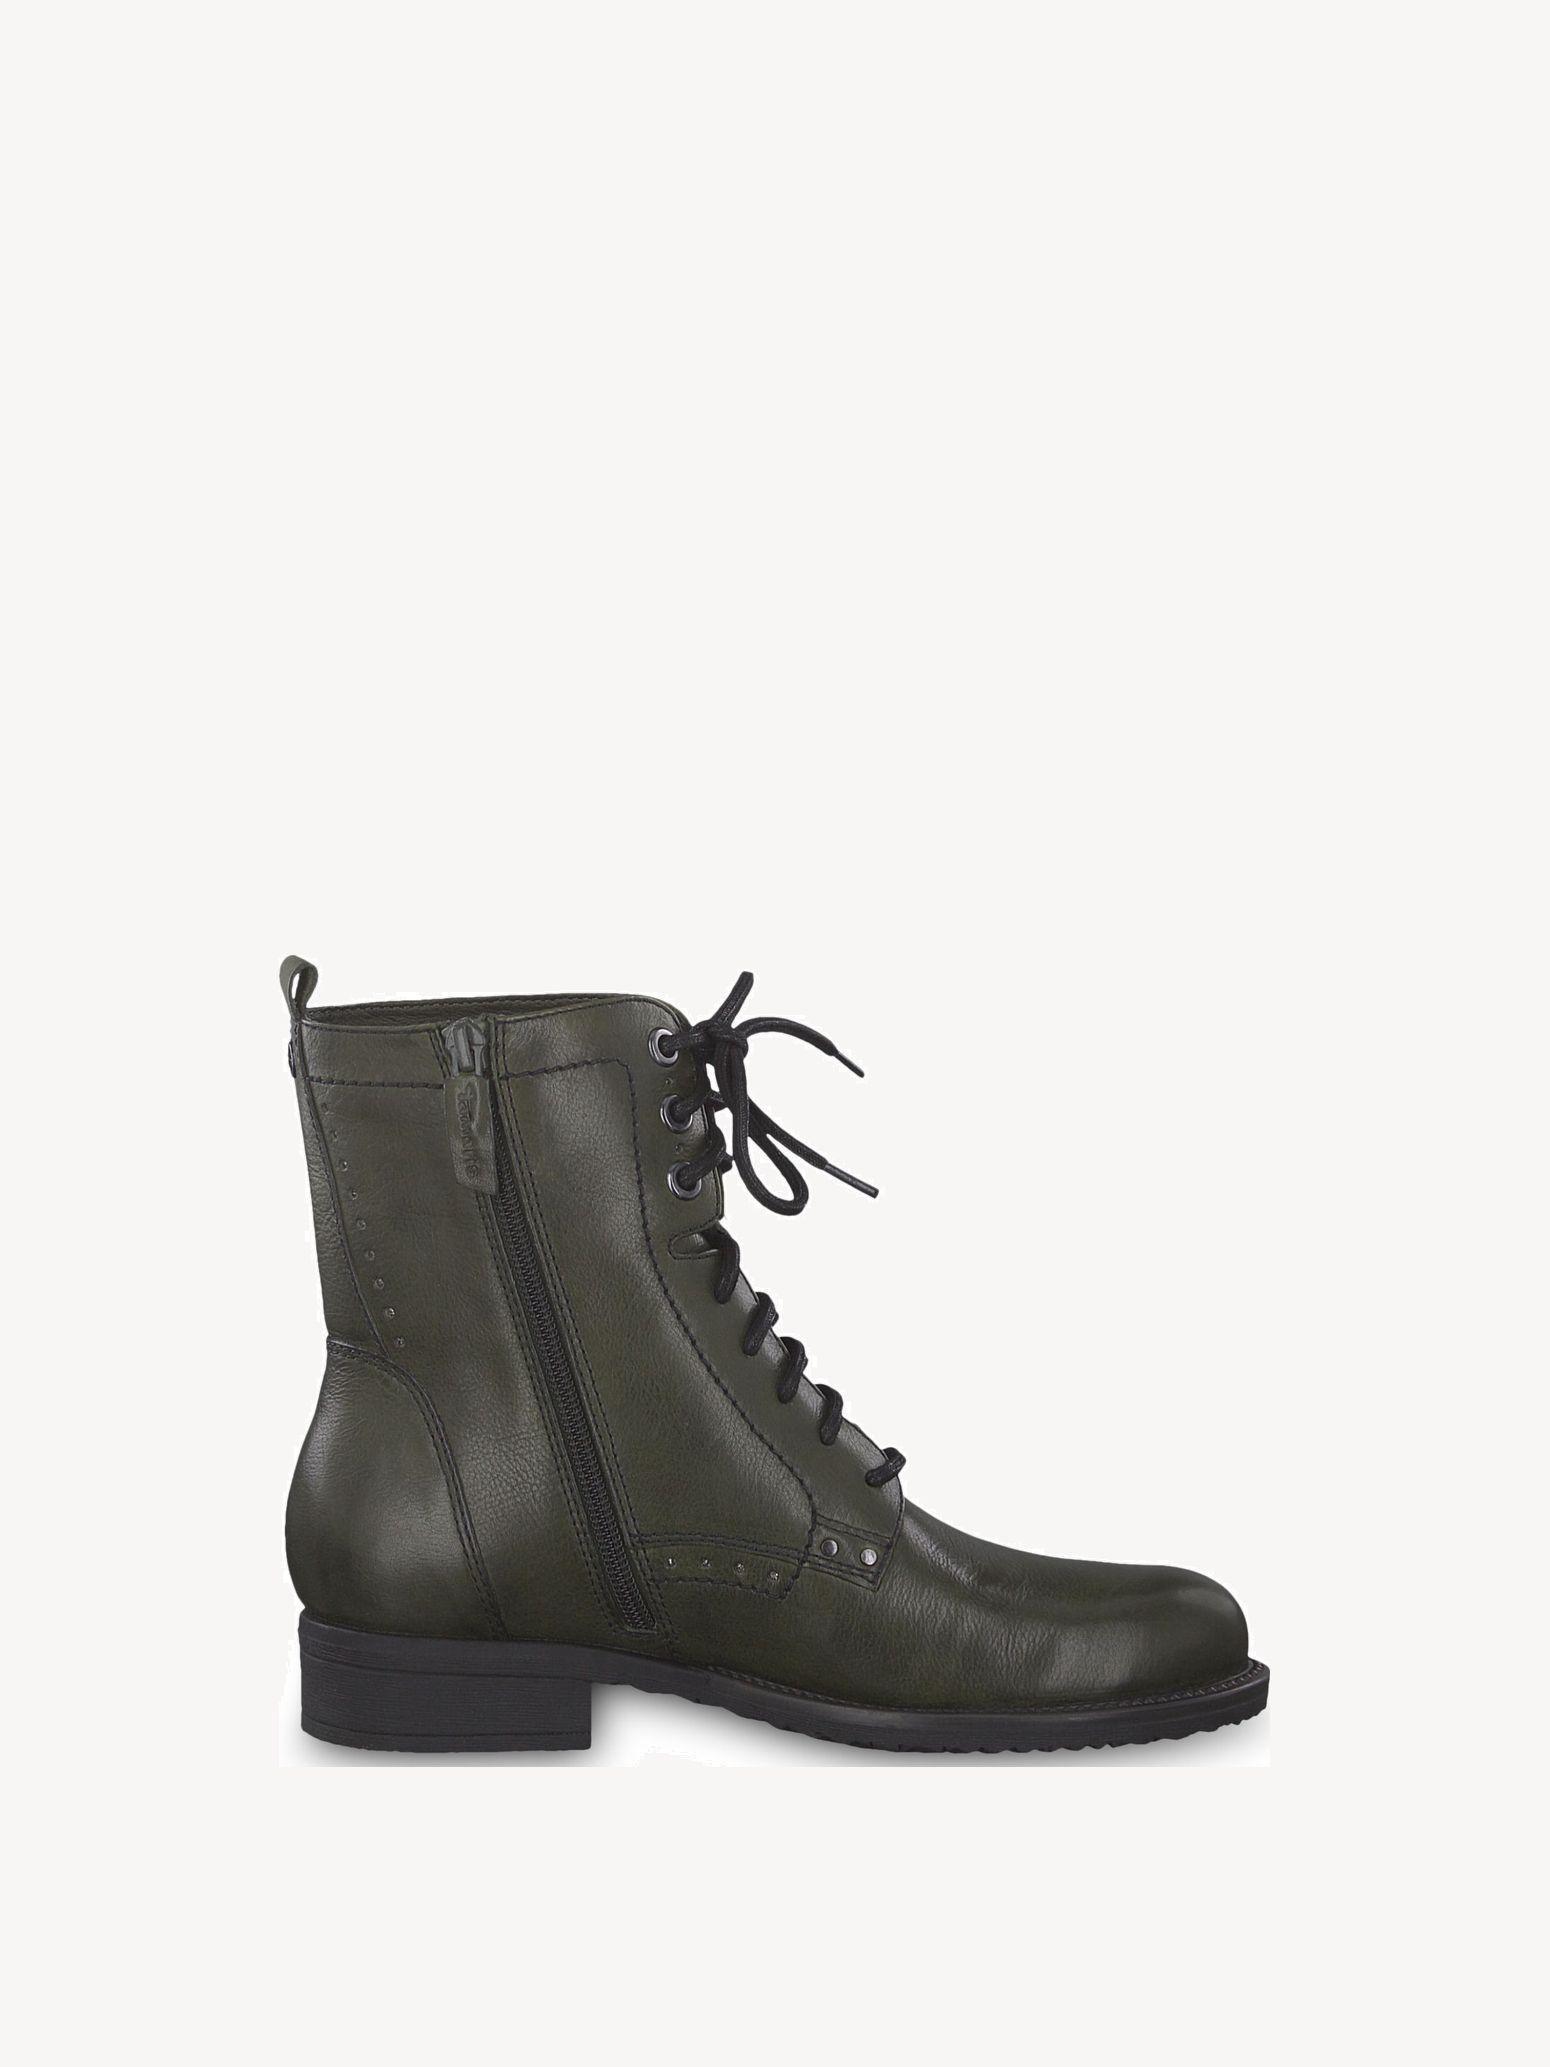 Best sale Boots TAMARIS 1 25217 39 Grey Women's shoes